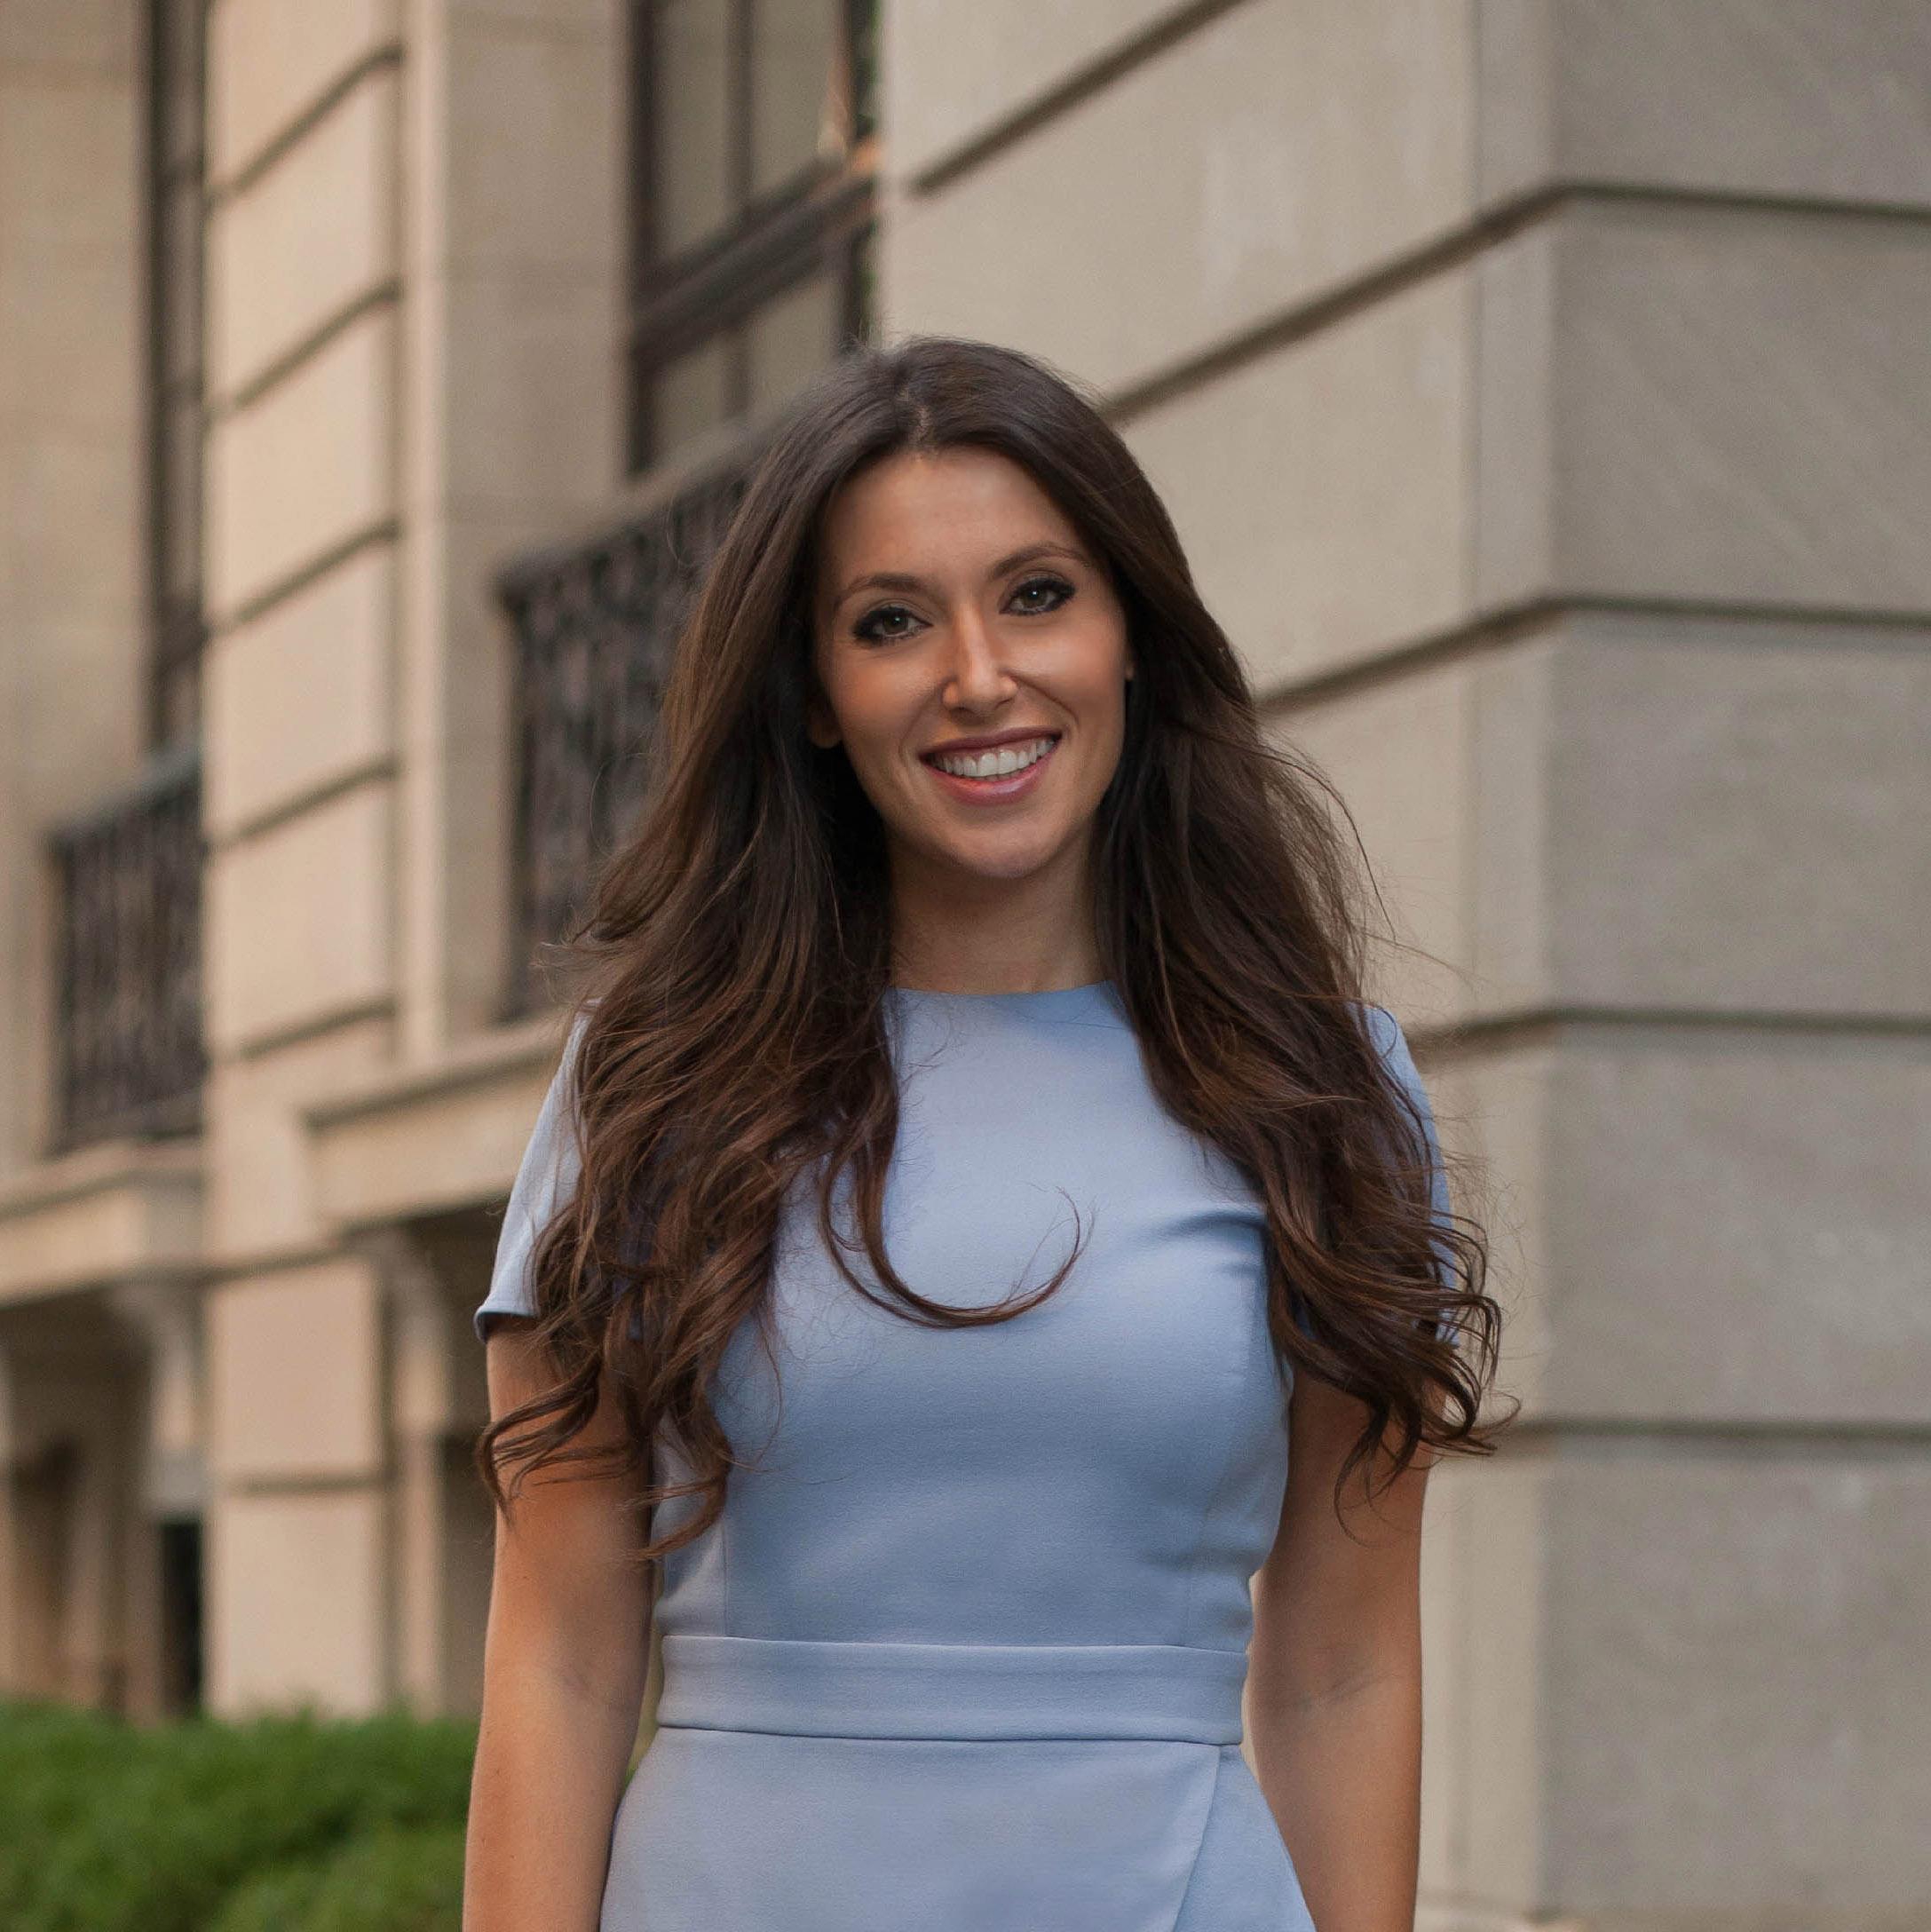 Headshot of Shani Shtern, a Chicago real estate agent